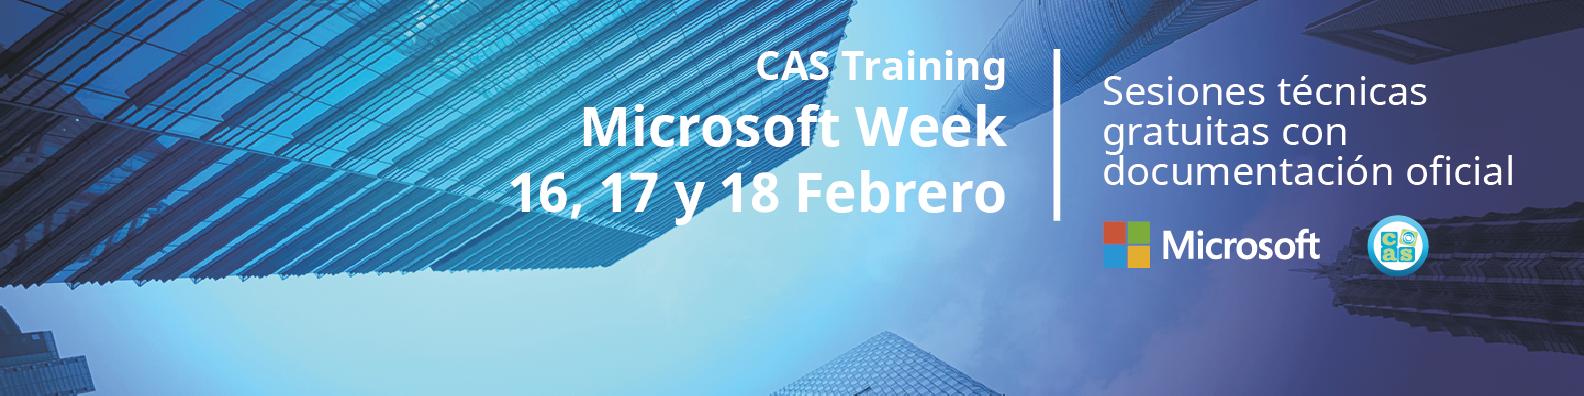 CAS Training Week